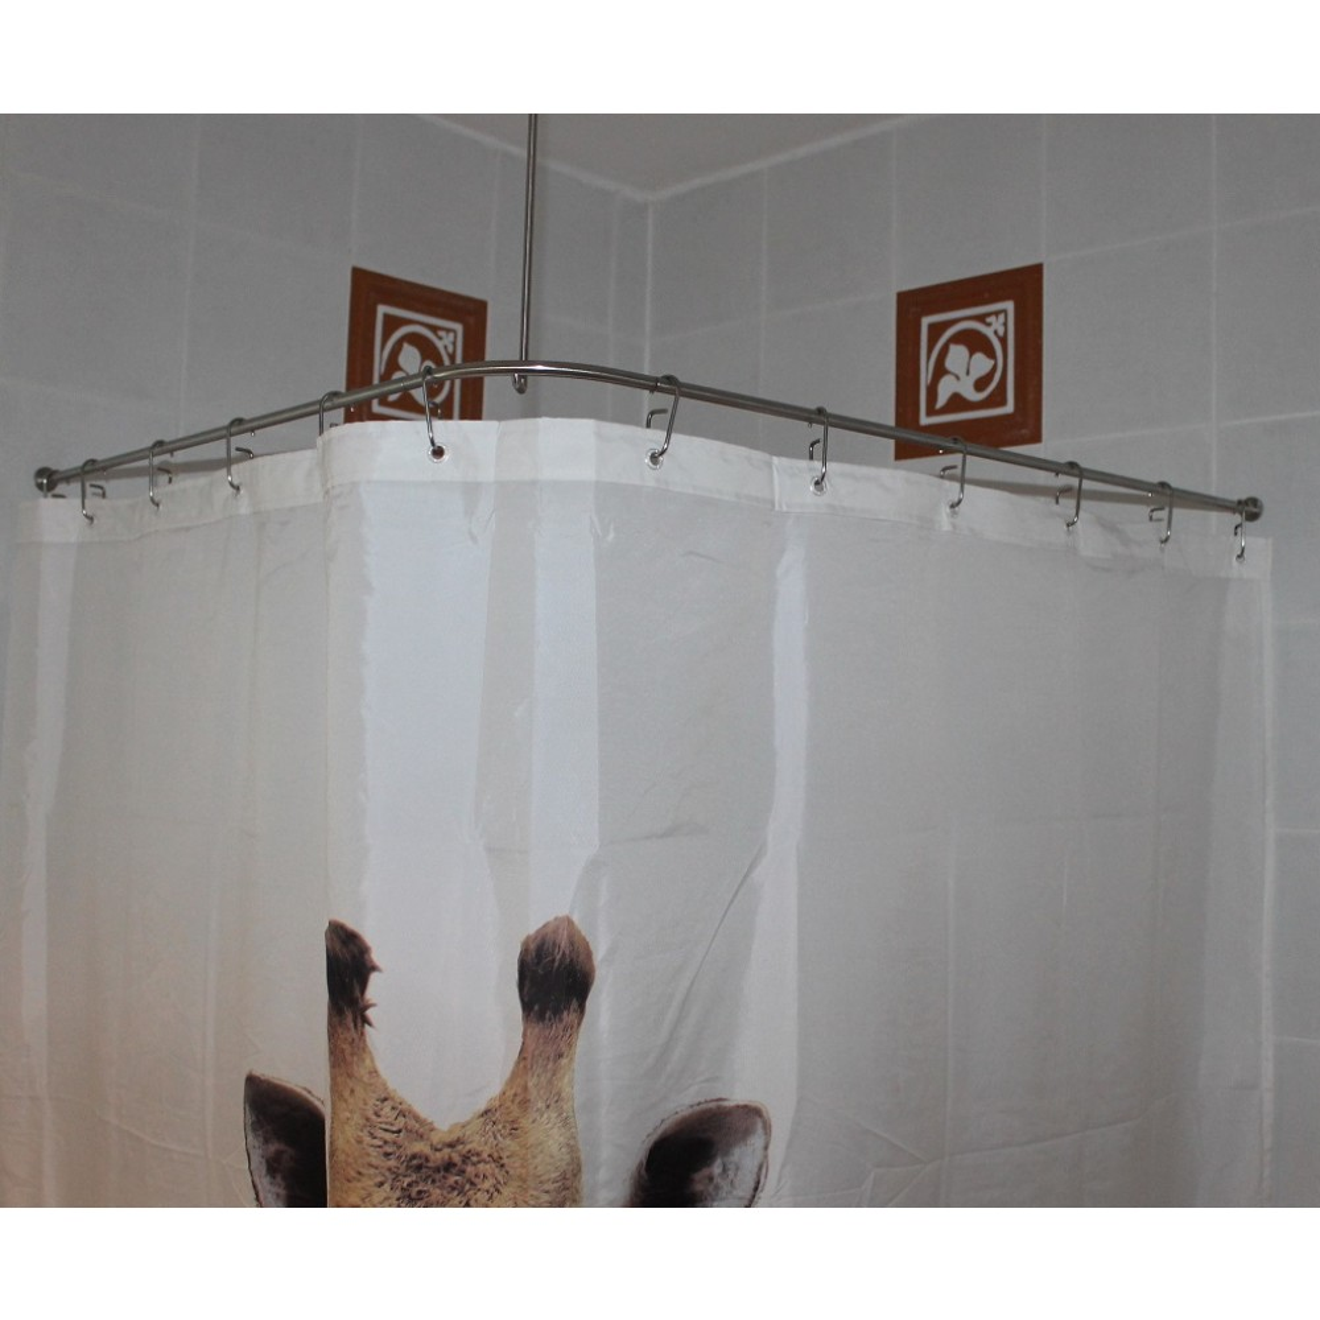 duschvorhangstange edelstahl 10 mm l form von burschberg. Black Bedroom Furniture Sets. Home Design Ideas